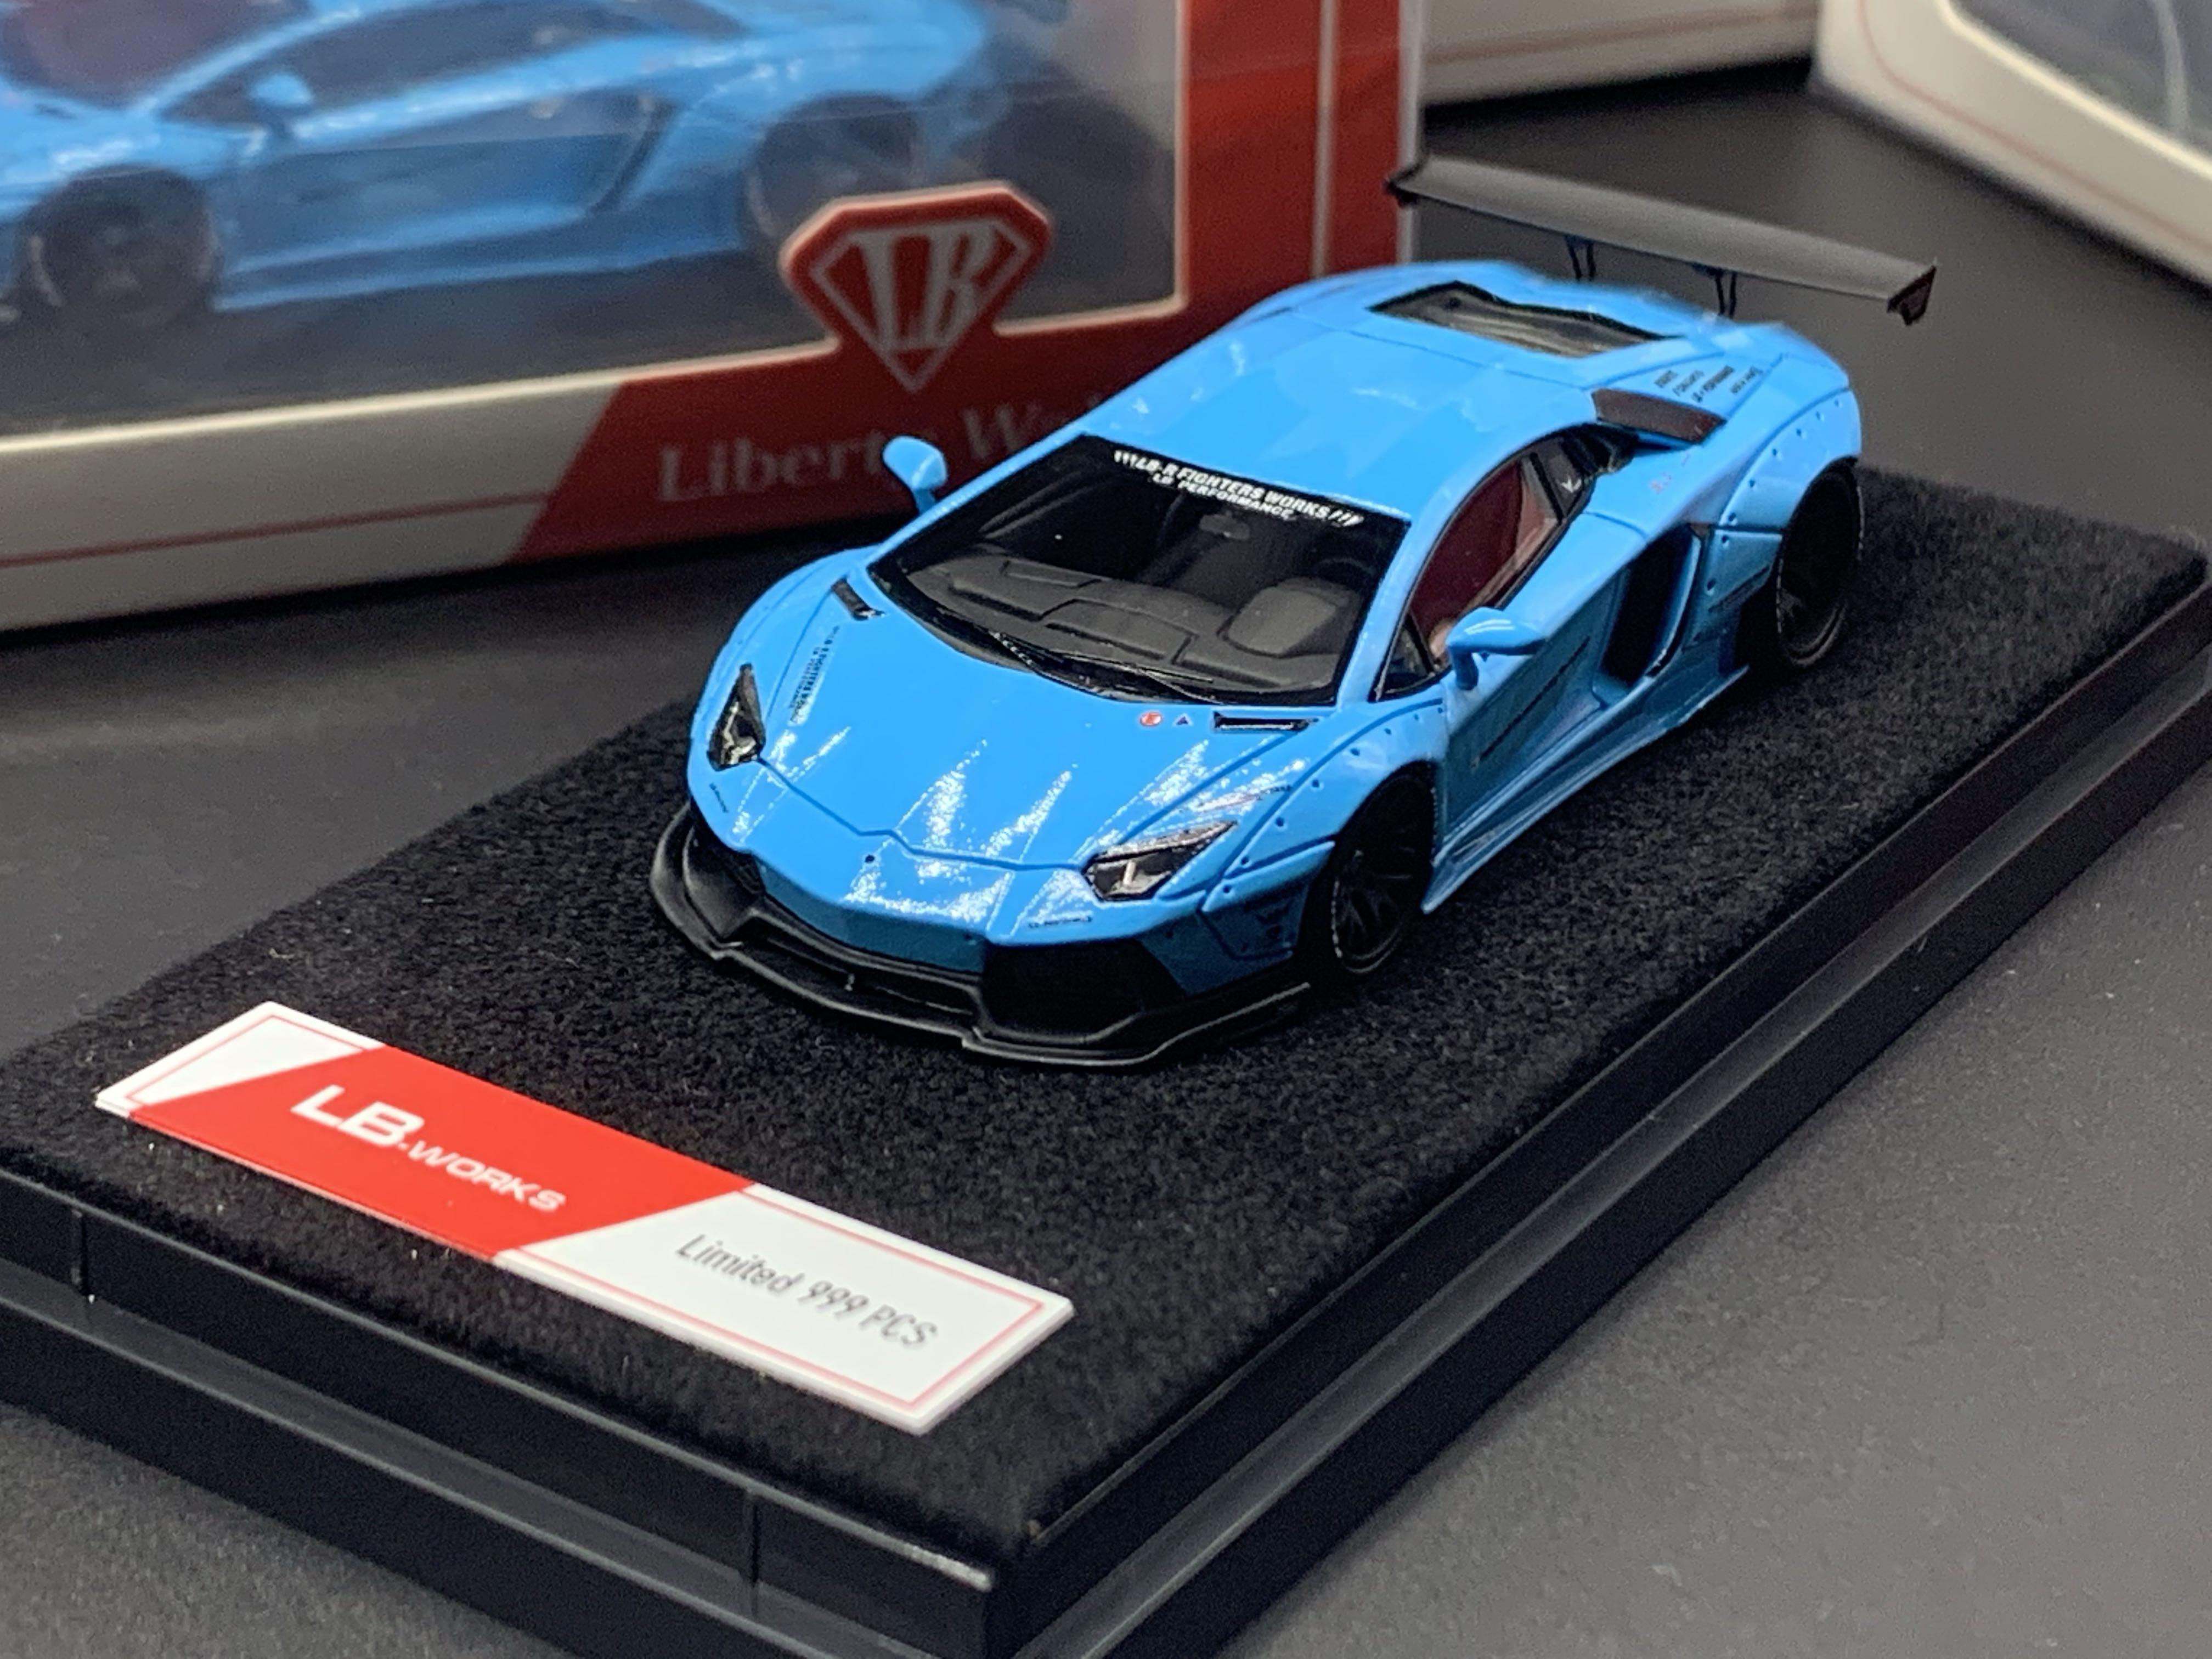 Liberty Walk 1 64 Lb Works Lamborghini Aventador Baby Blue Toys